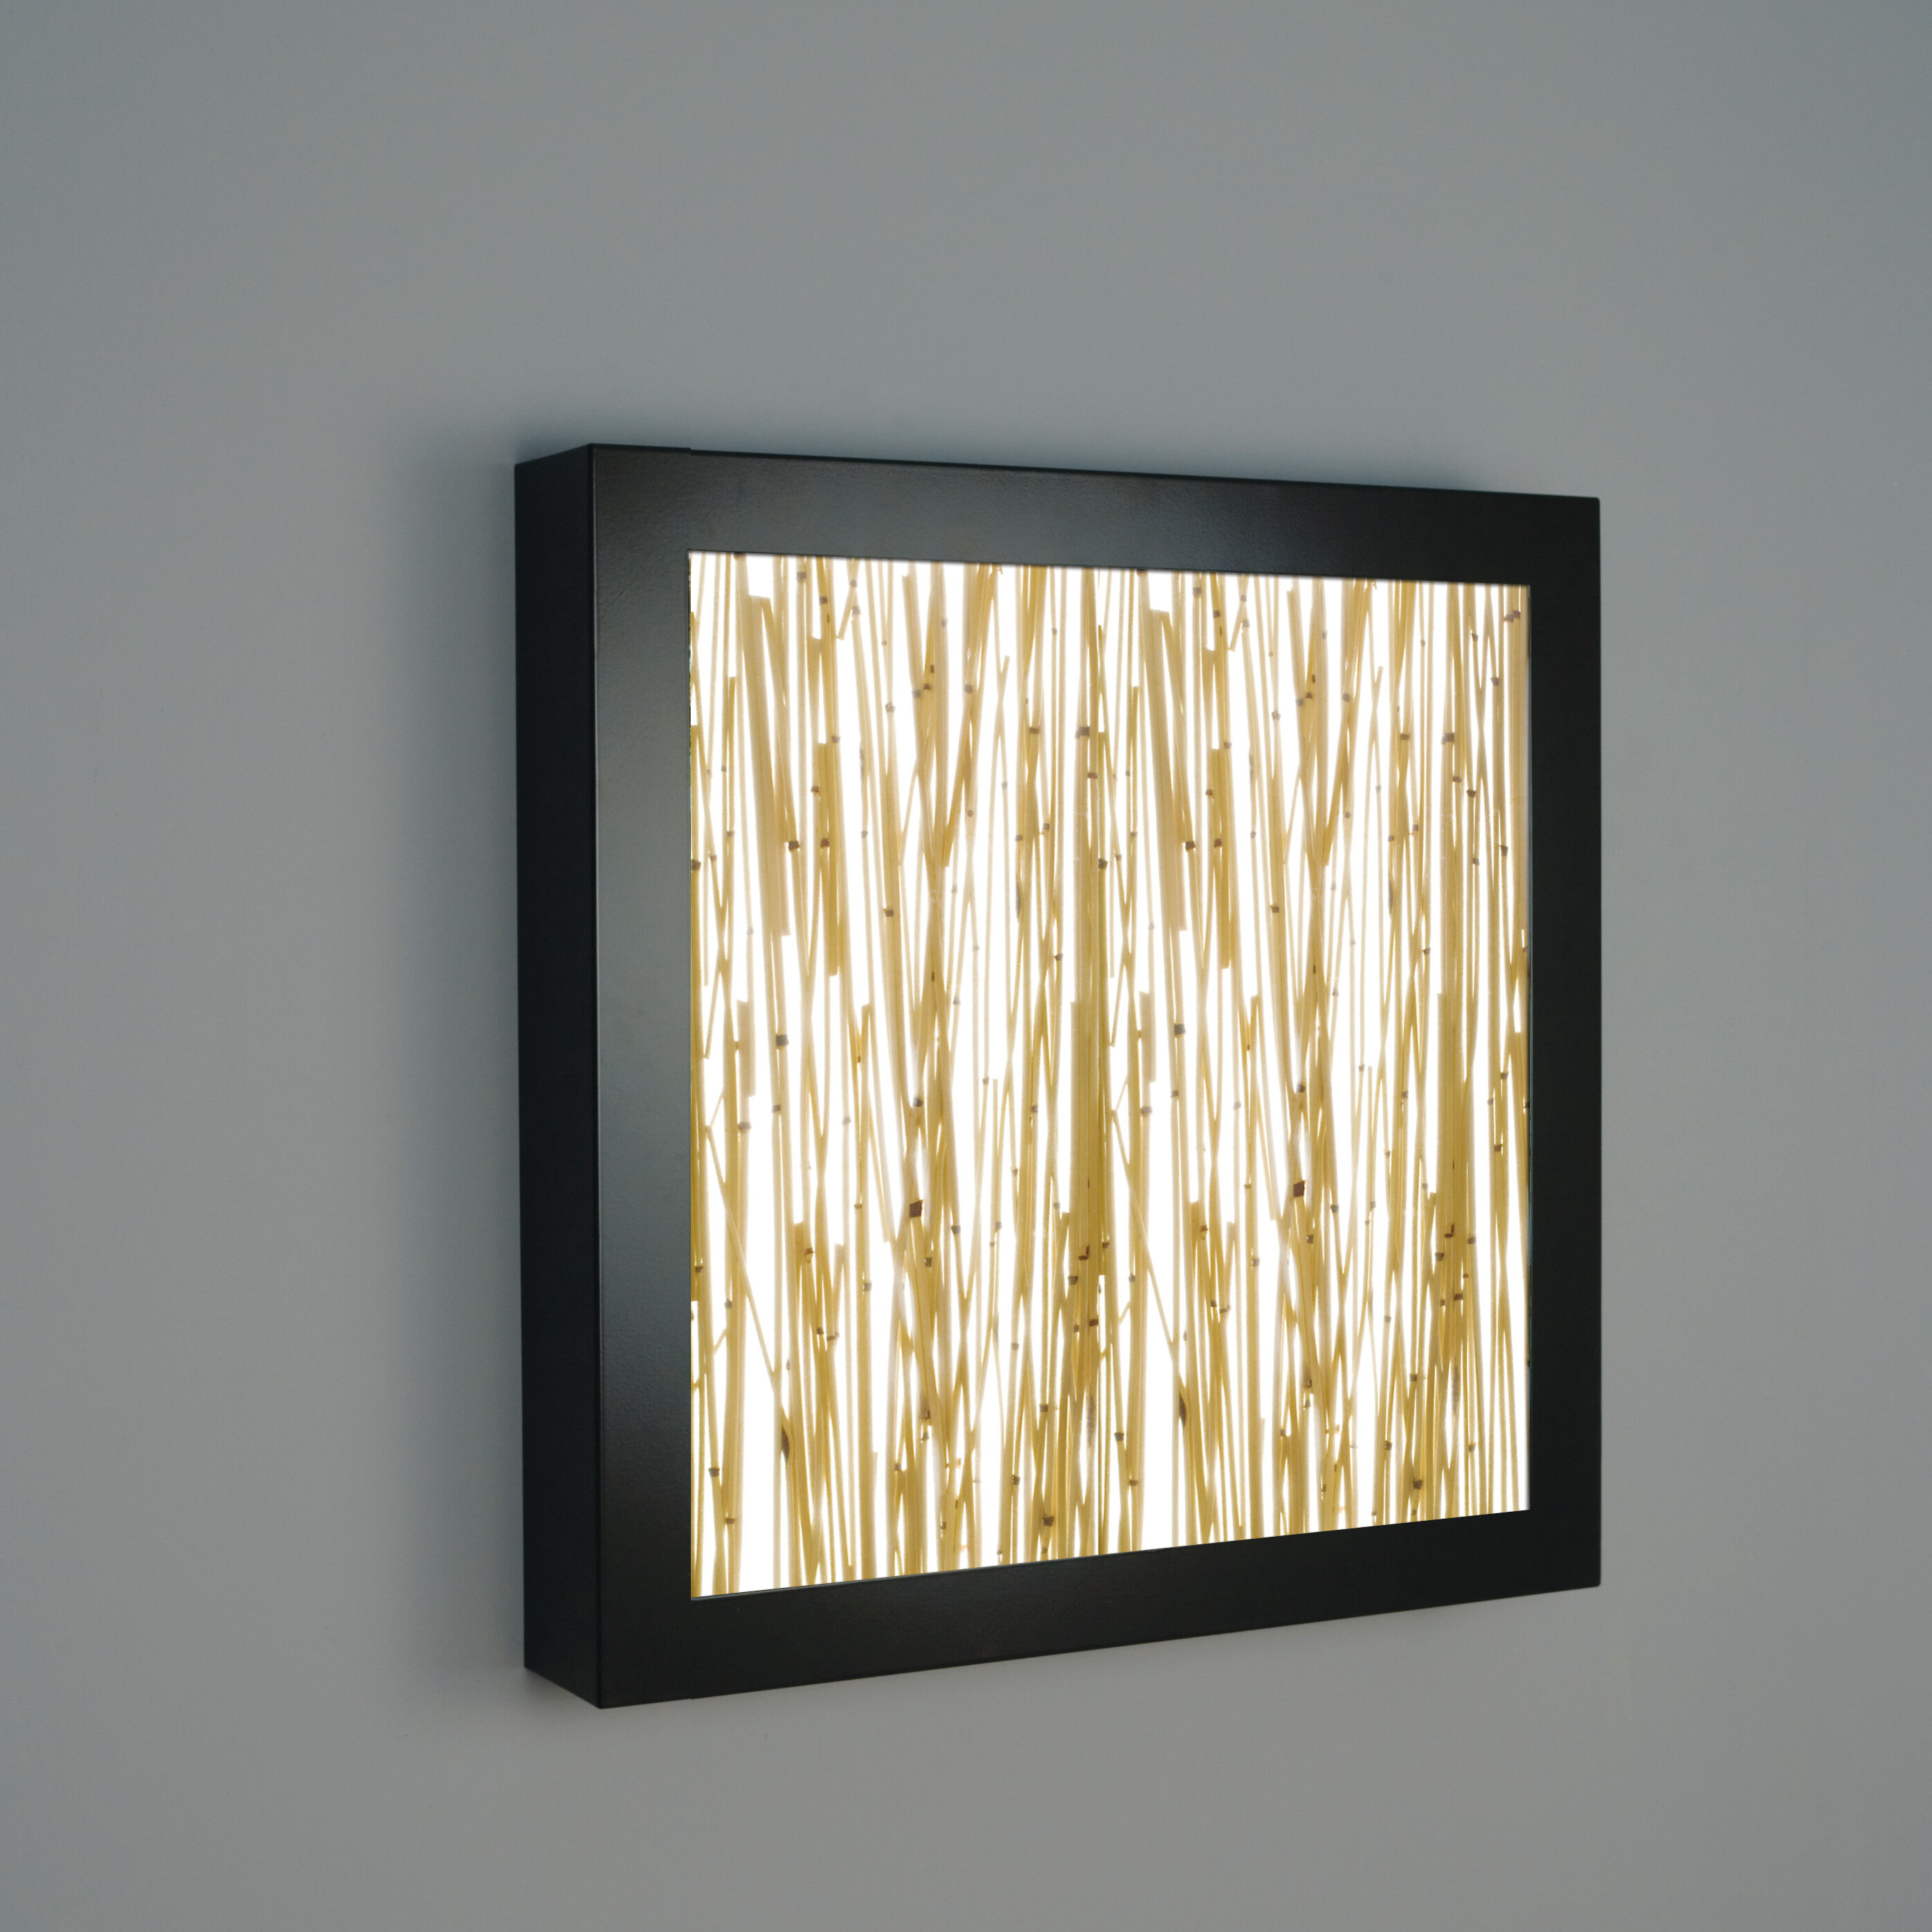 WPT Design VII Light Wall Sconce Wayfair - 4 light bathroom sconce